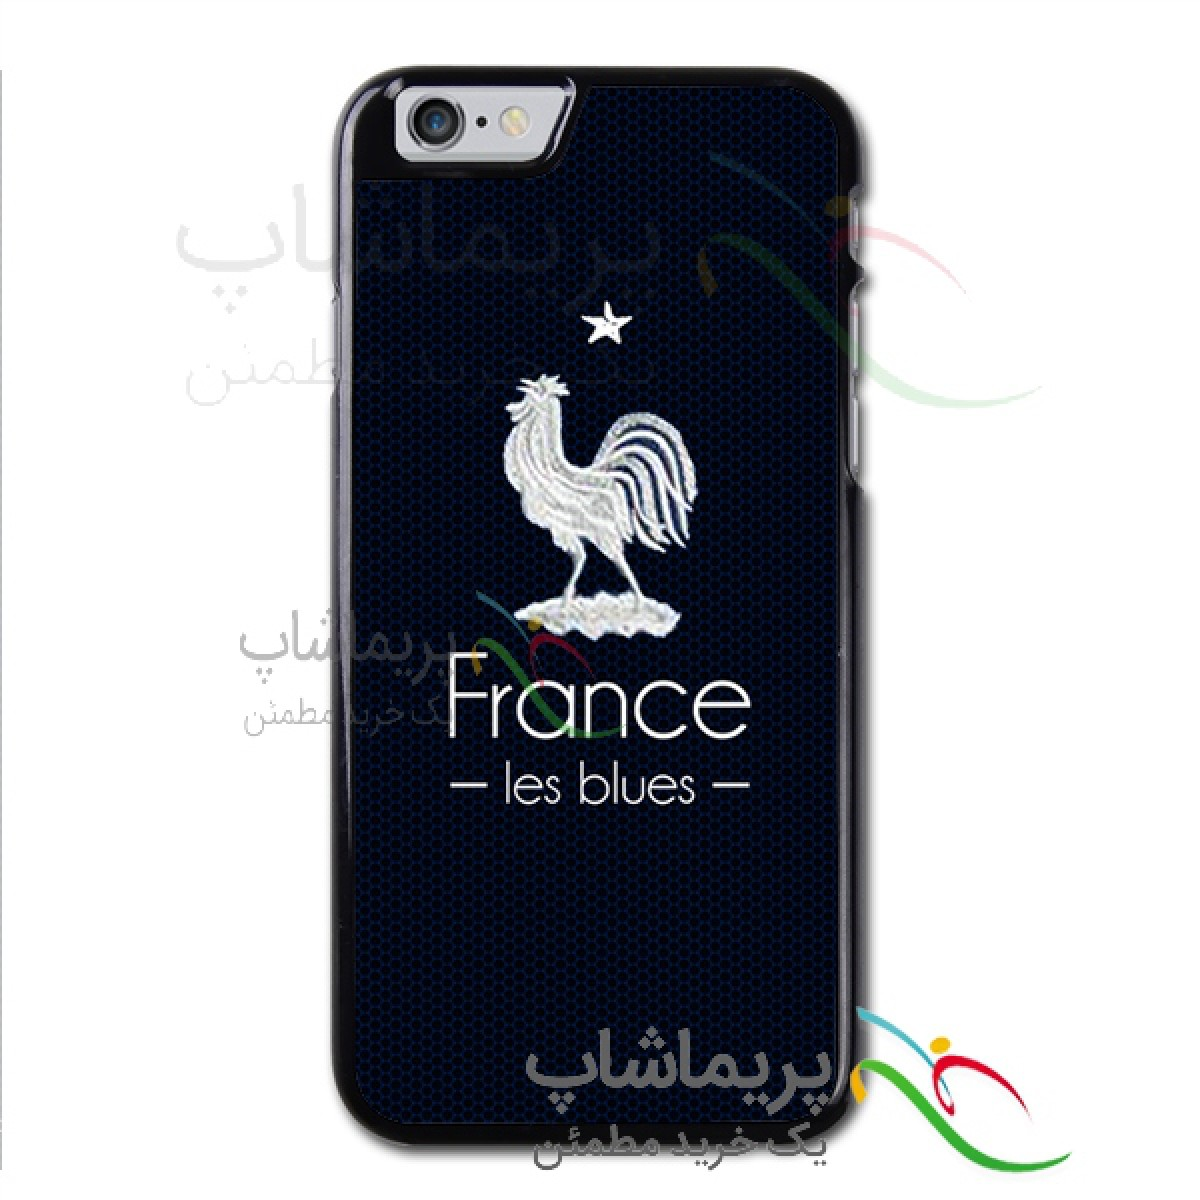 قاب موبایل فرانسه طرح یک